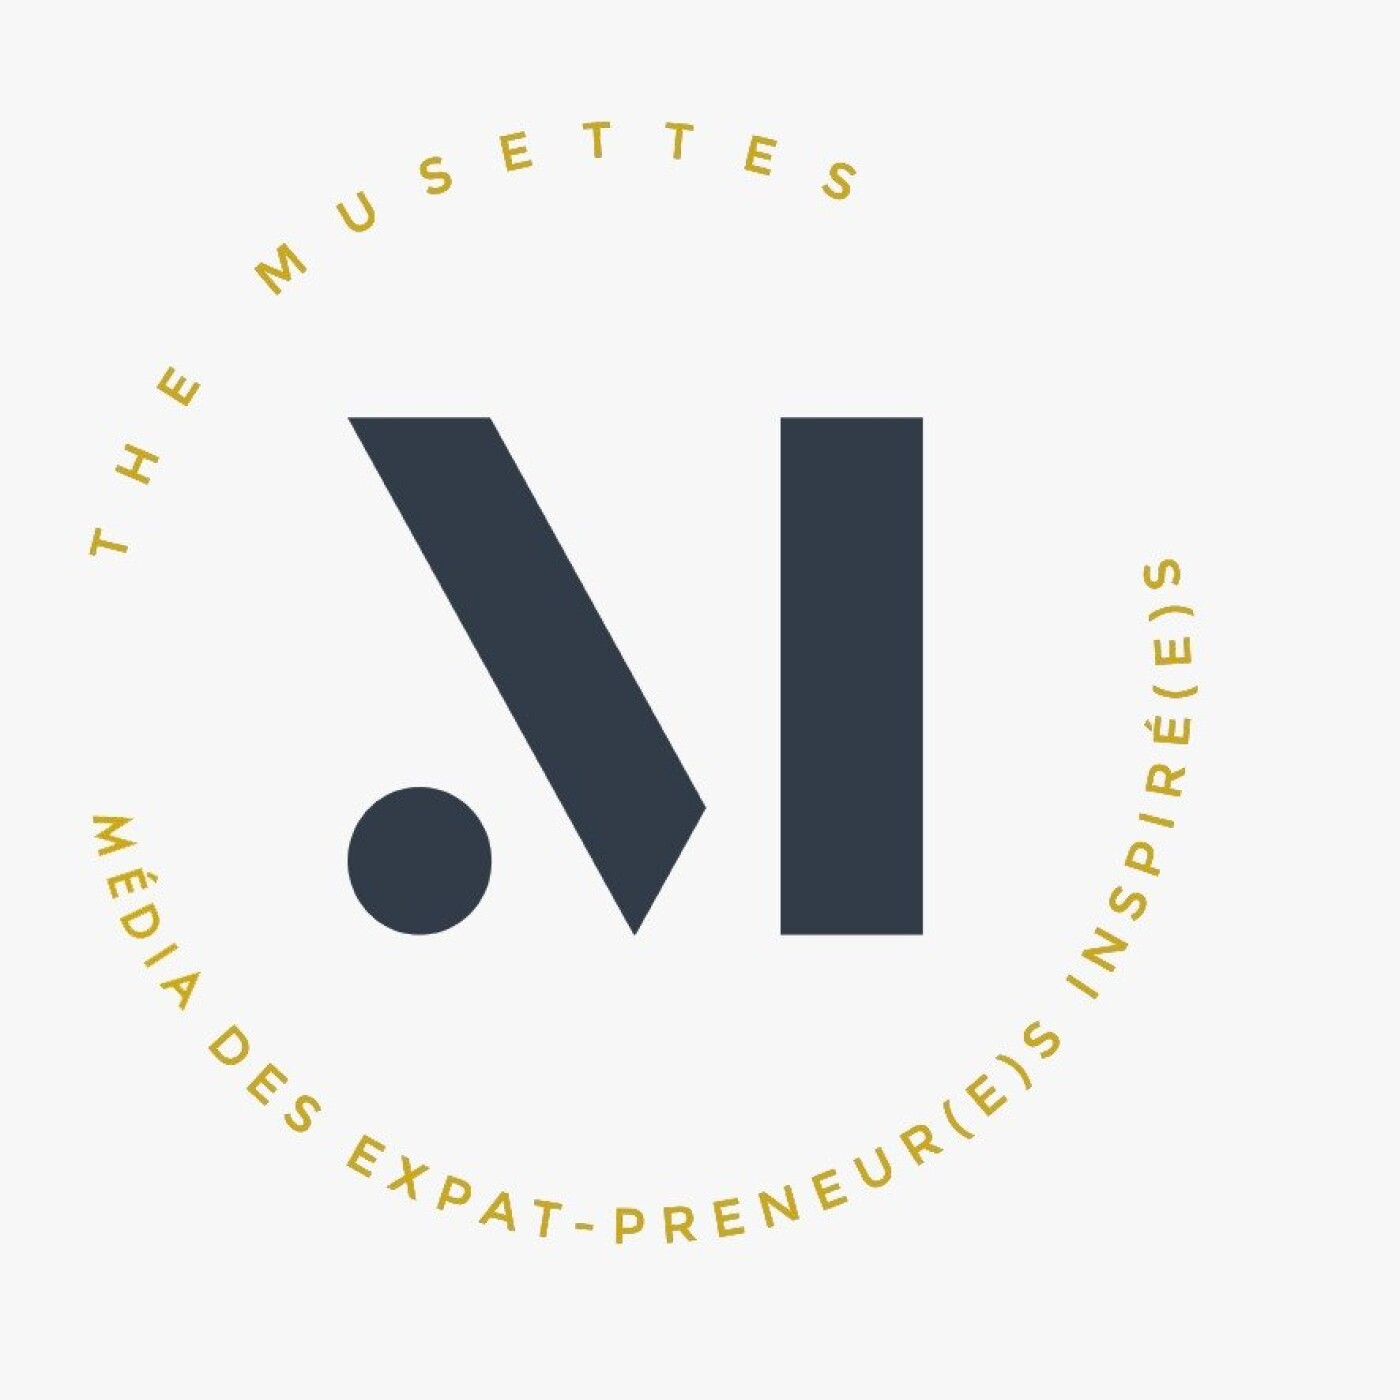 Adeline présente son média en ligne The Musettes - 15 04 2021 - StereoChic Radio